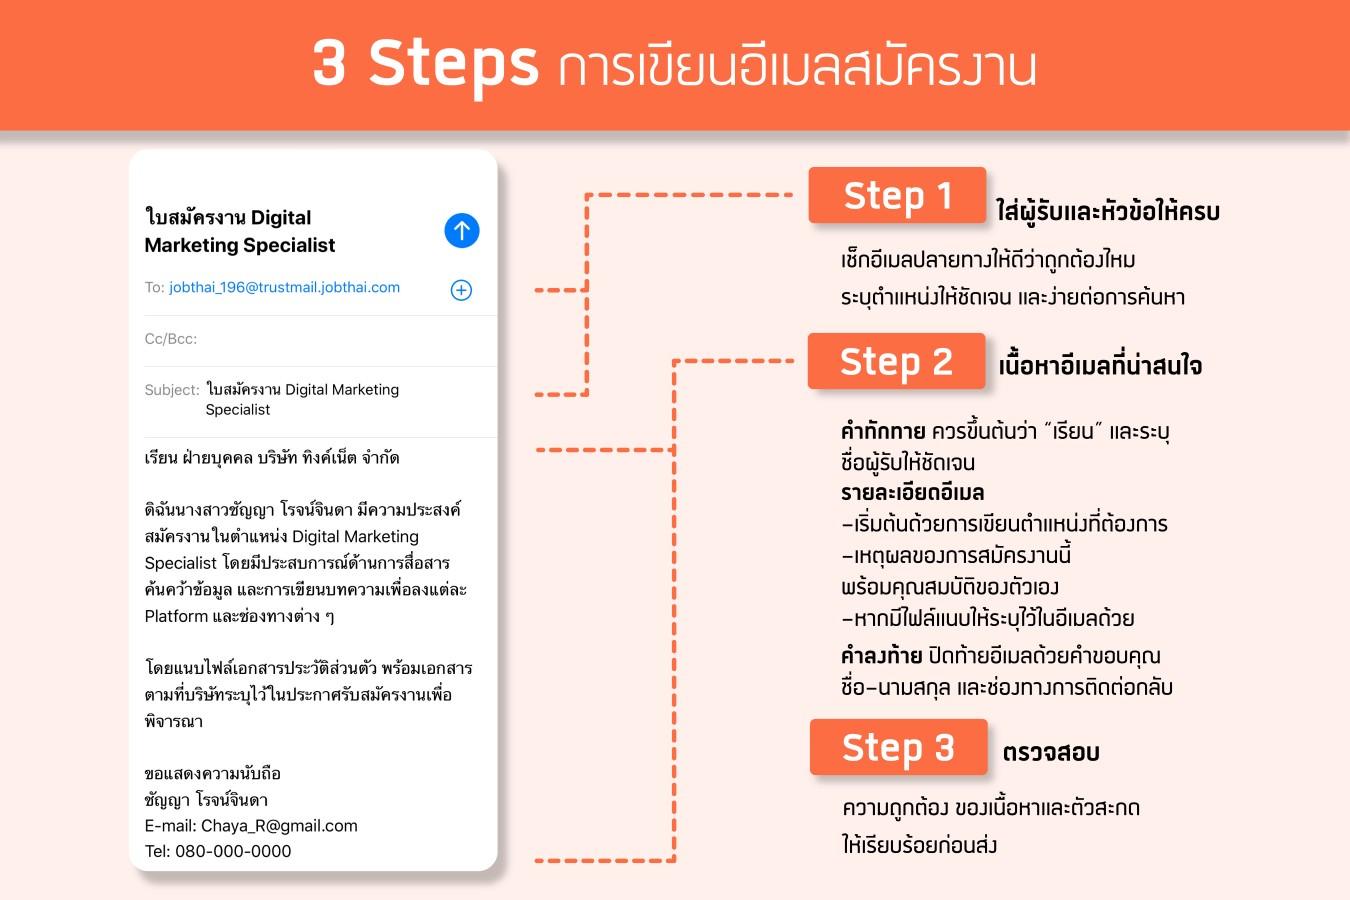 3 STEPการเขียนอีเมลสมัครงานให้ถูกต้อง